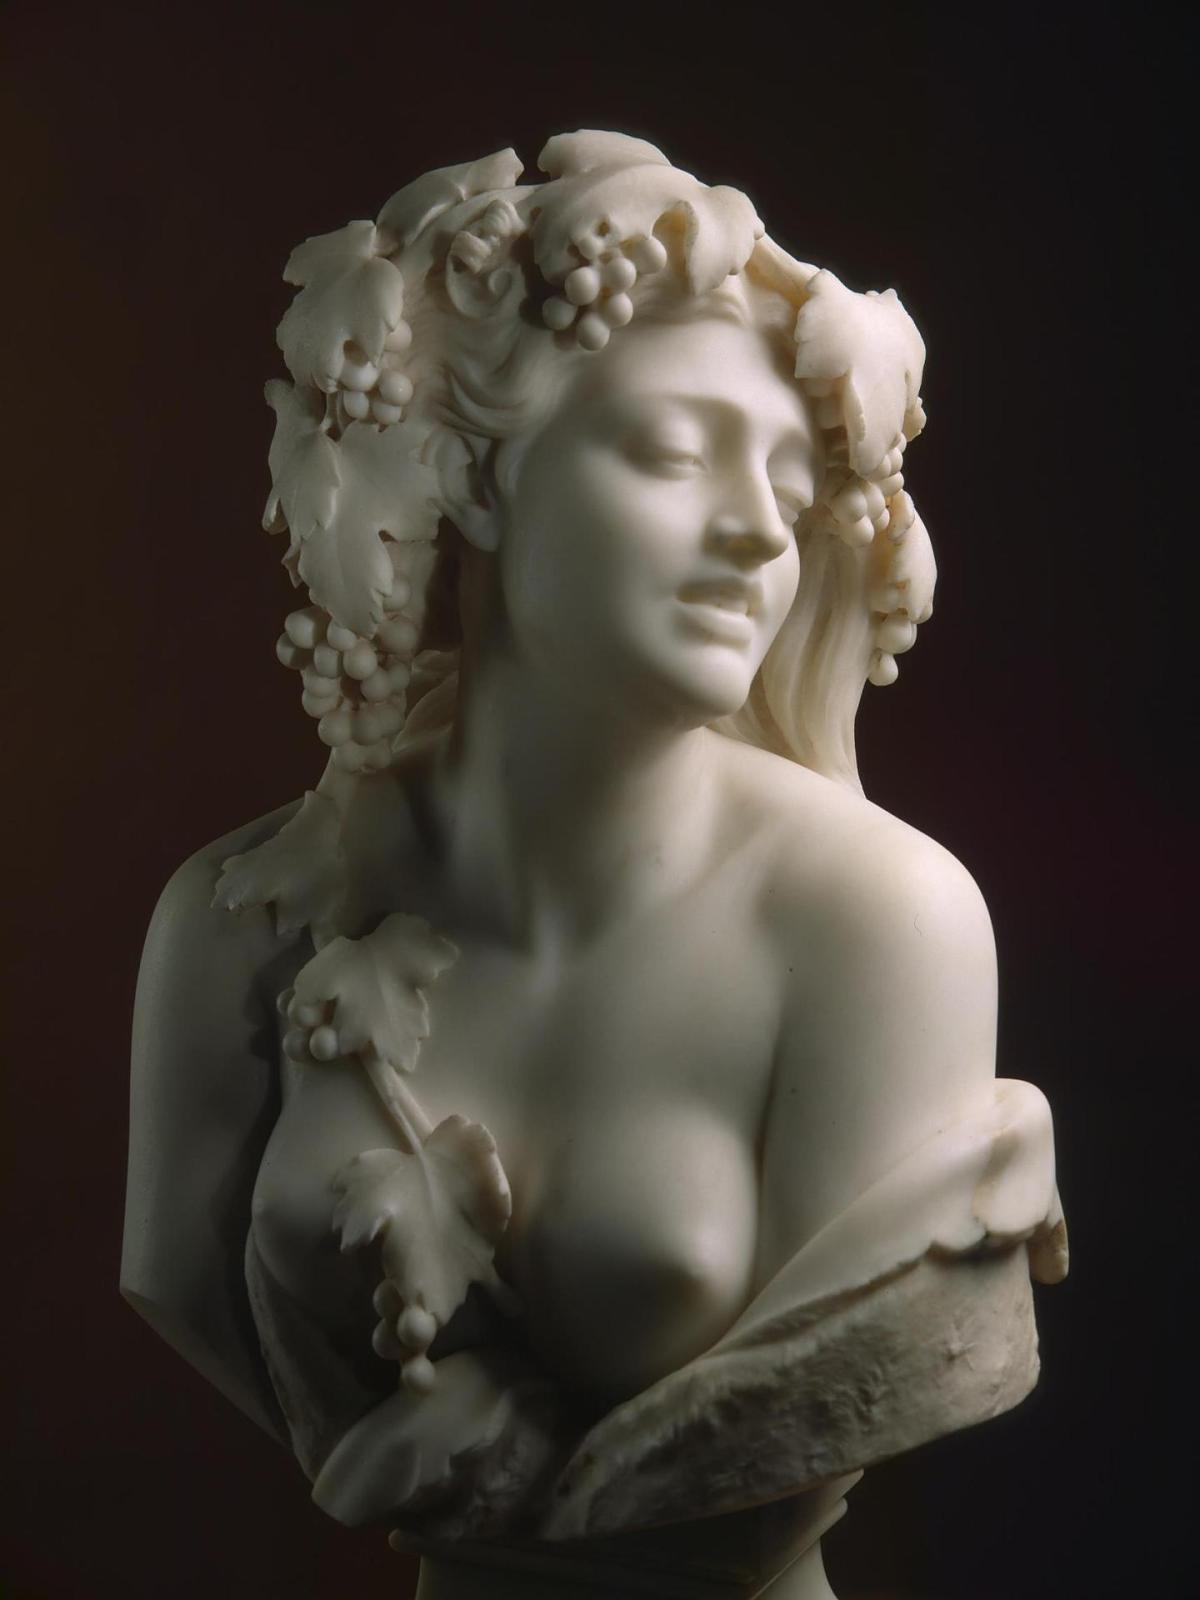 Bacchante by Prosper d'Epinay